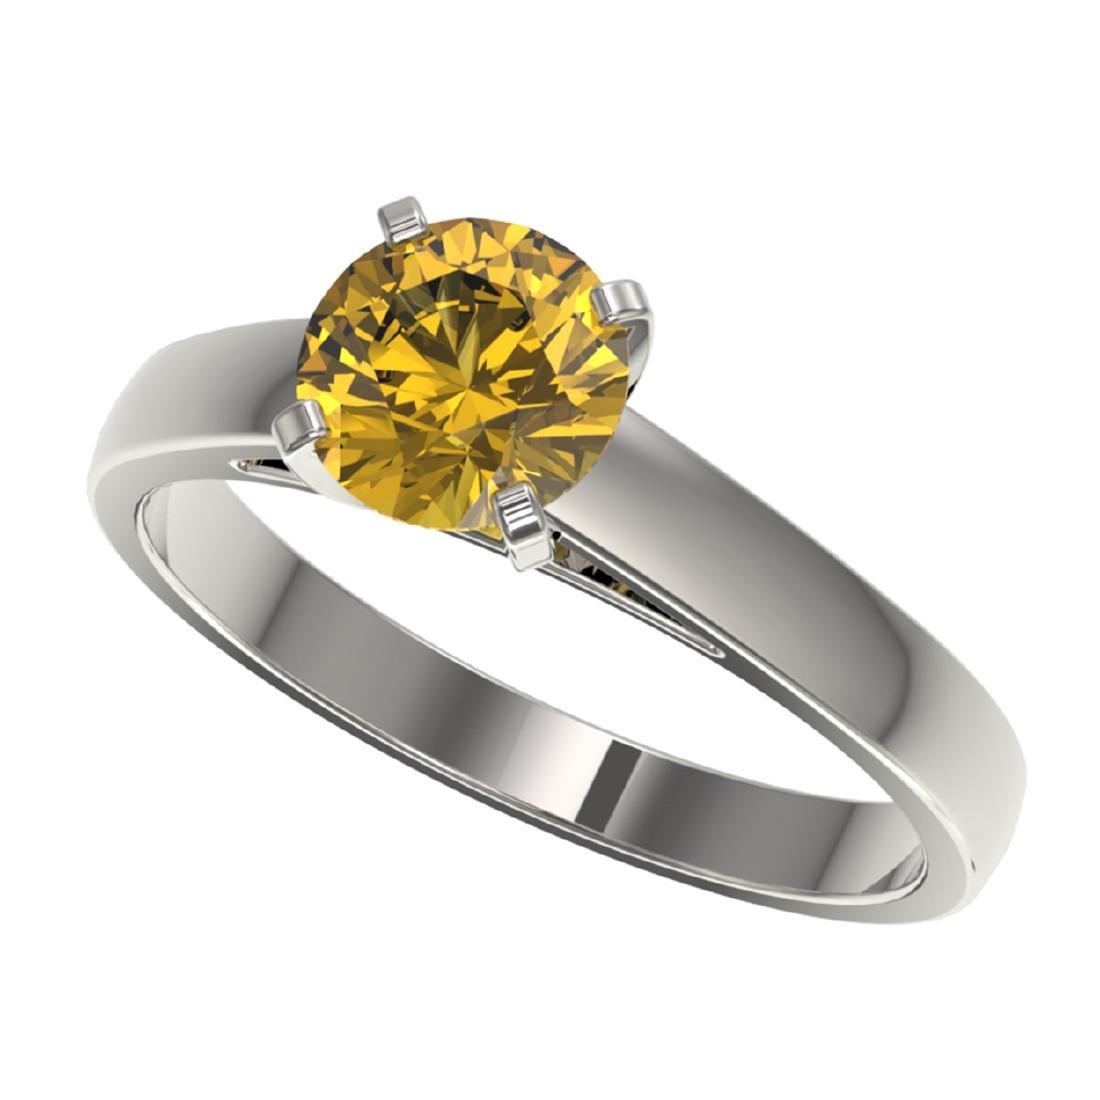 1.29 ctw Intense Yellow Diamond Solitaire Ring 10K